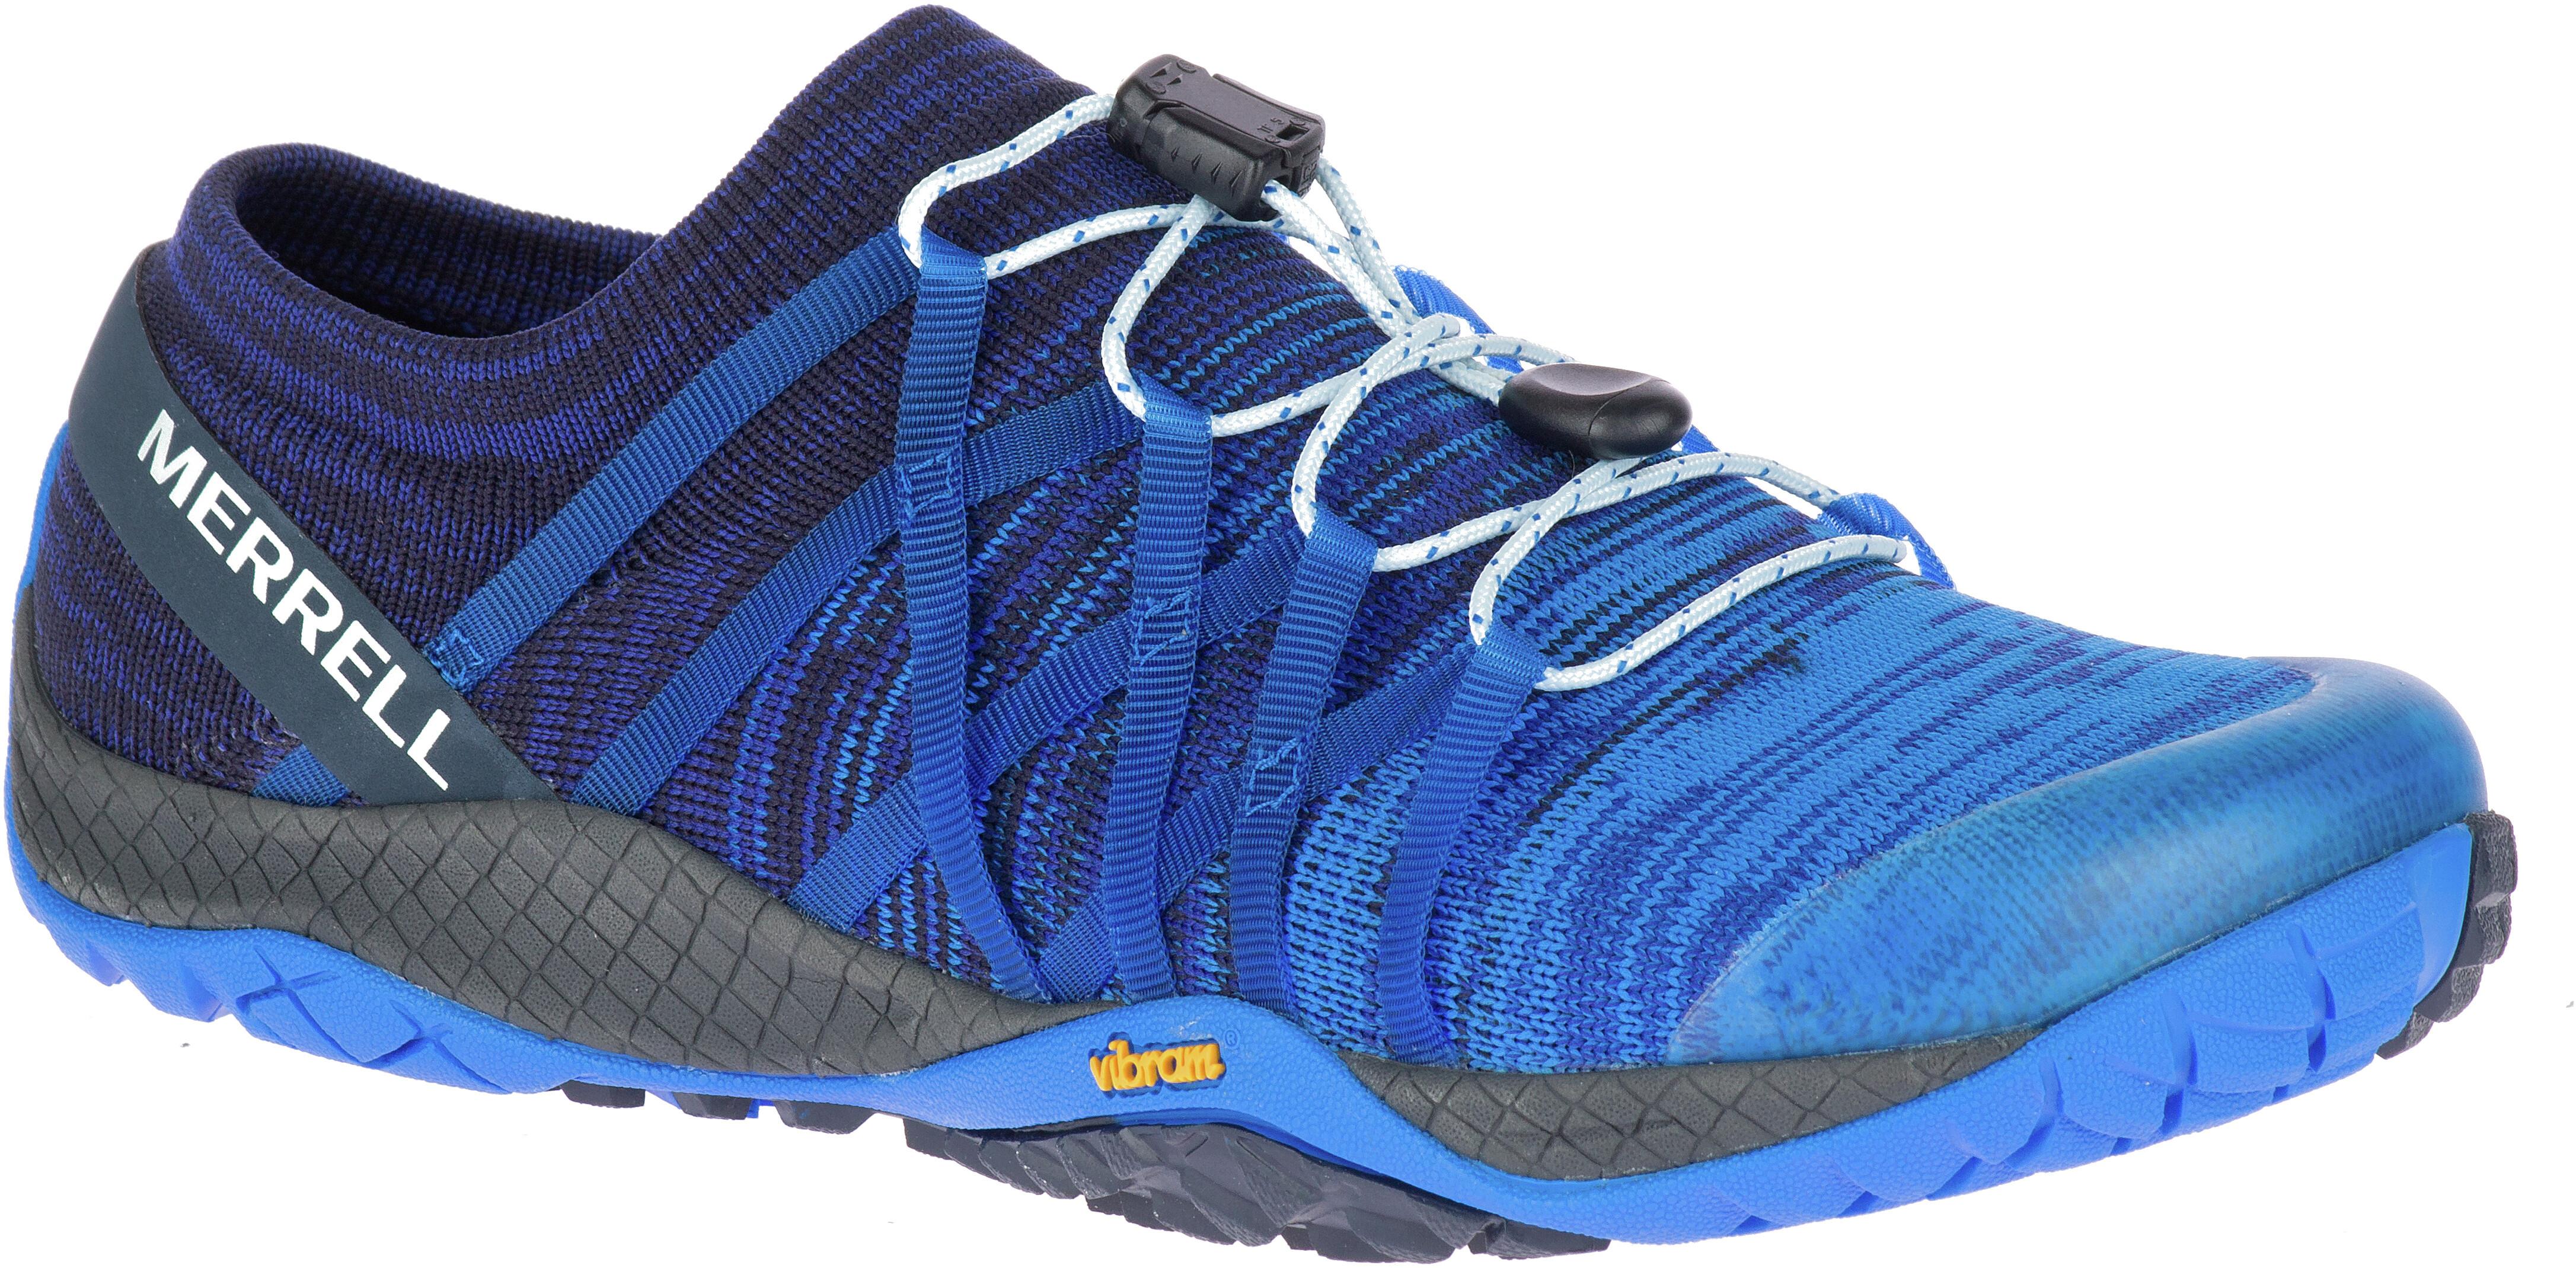 best service 4fea5 17891 Merrell Trail Glove 4 Knit Shoes Women blue sport